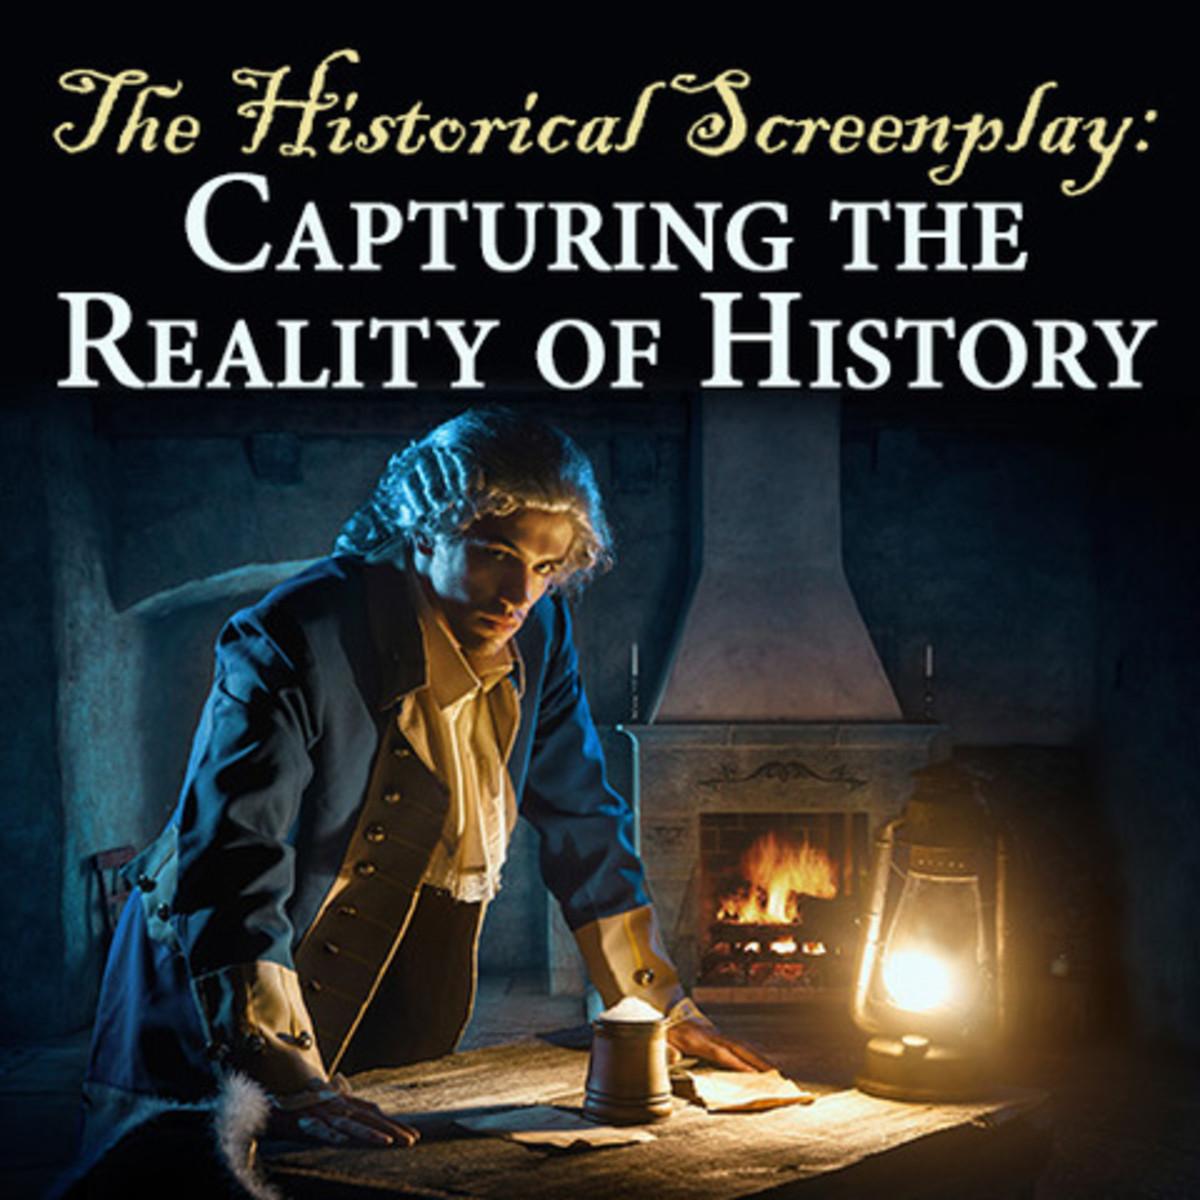 ws_historical screenplay-500.jpg_medium